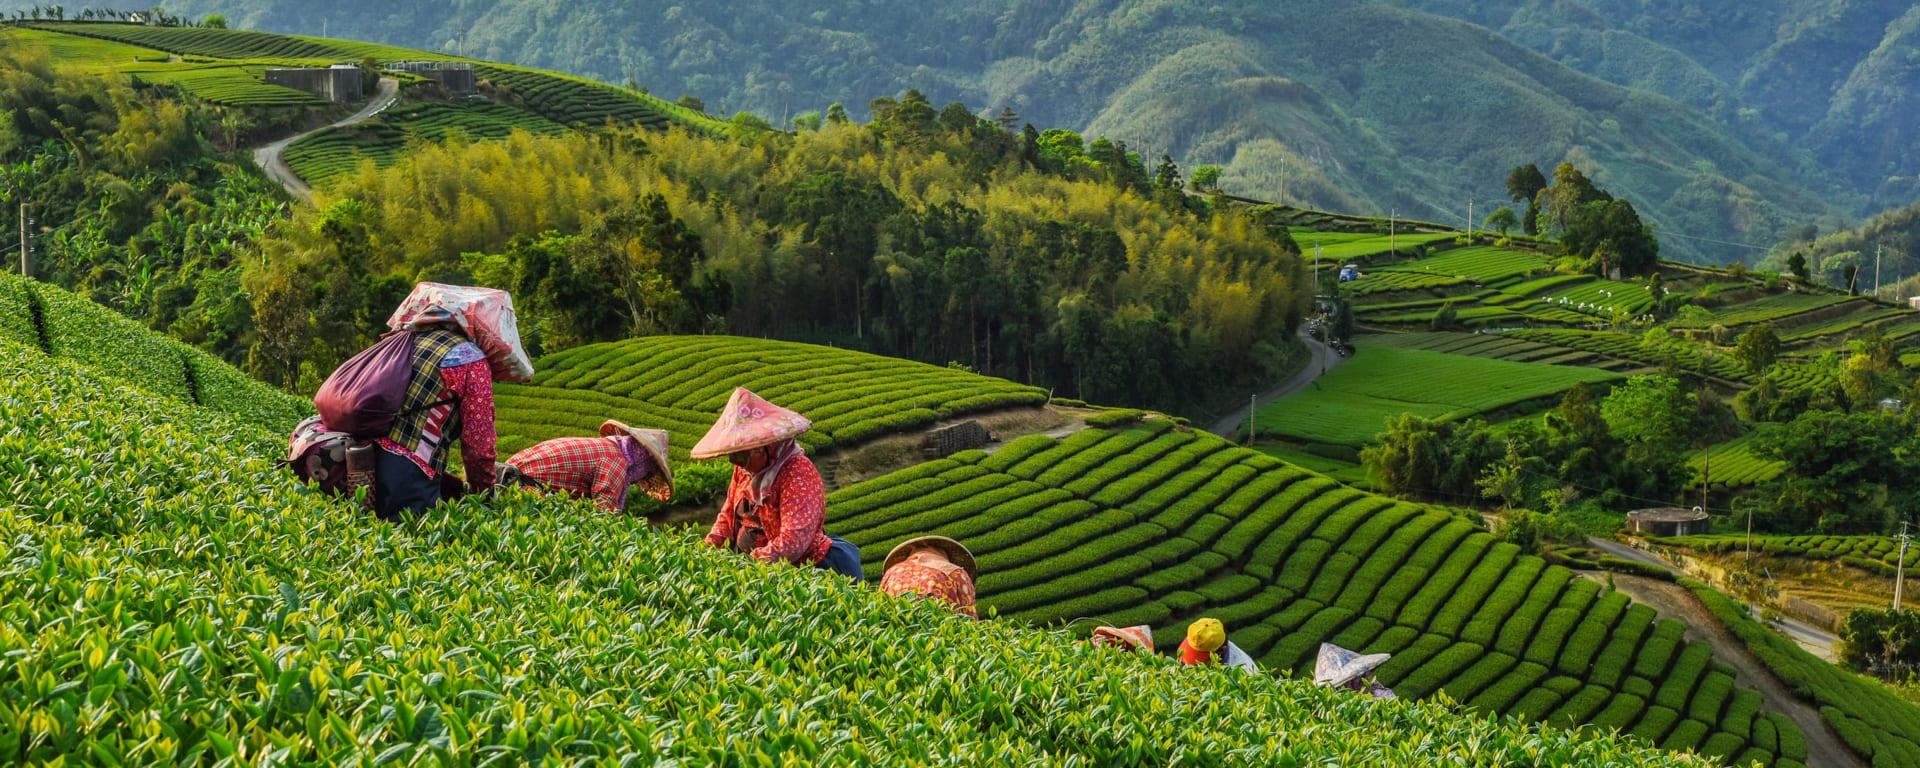 Taiwan entdecken mit Tischler Reisen: Taiwan Alishan Oolong Tee Plantage